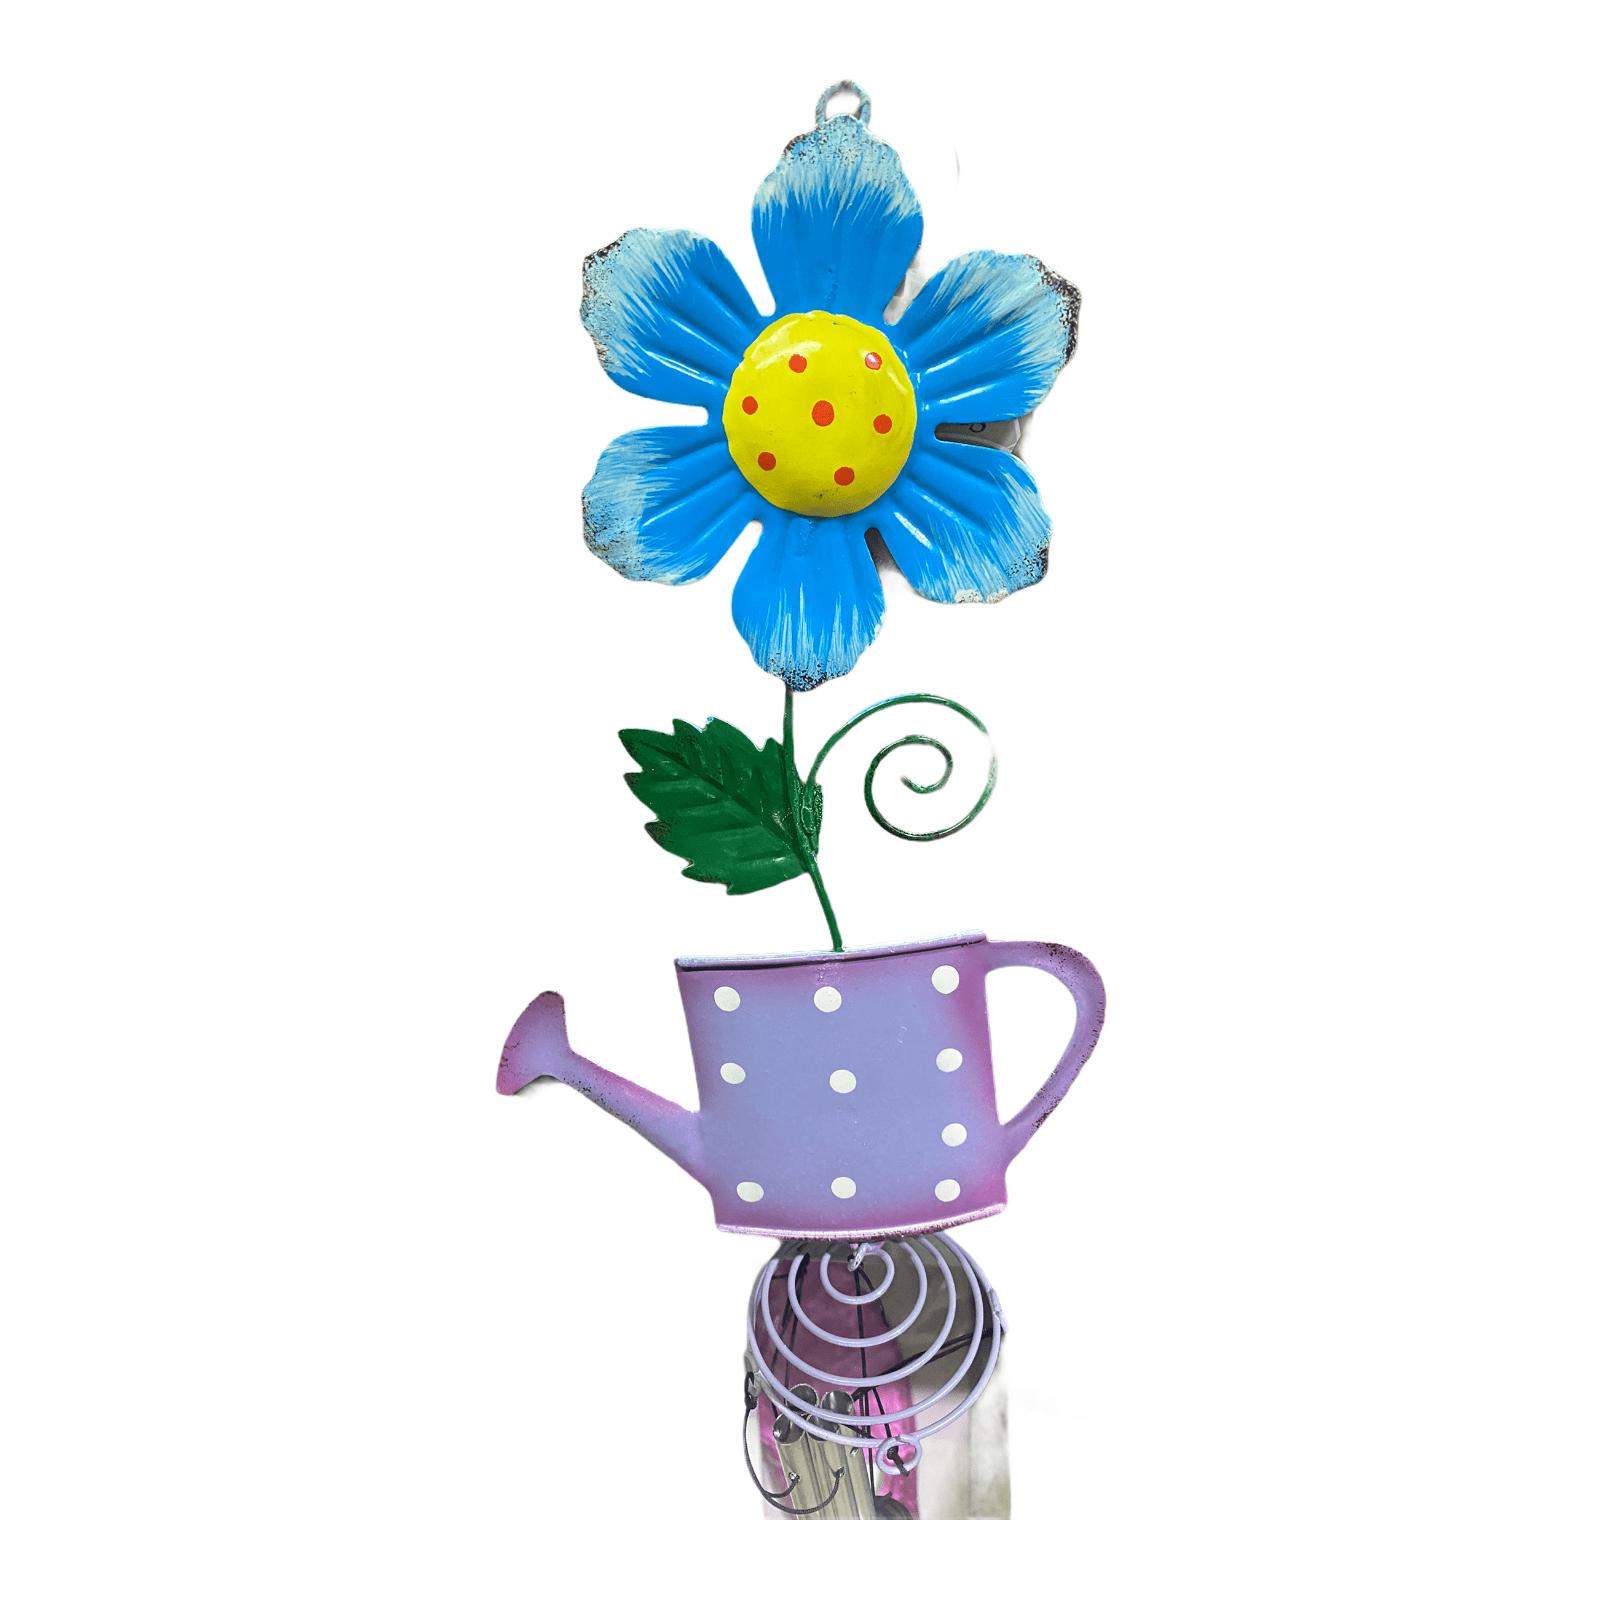 Windspiel Blume mit Gießkanne lila